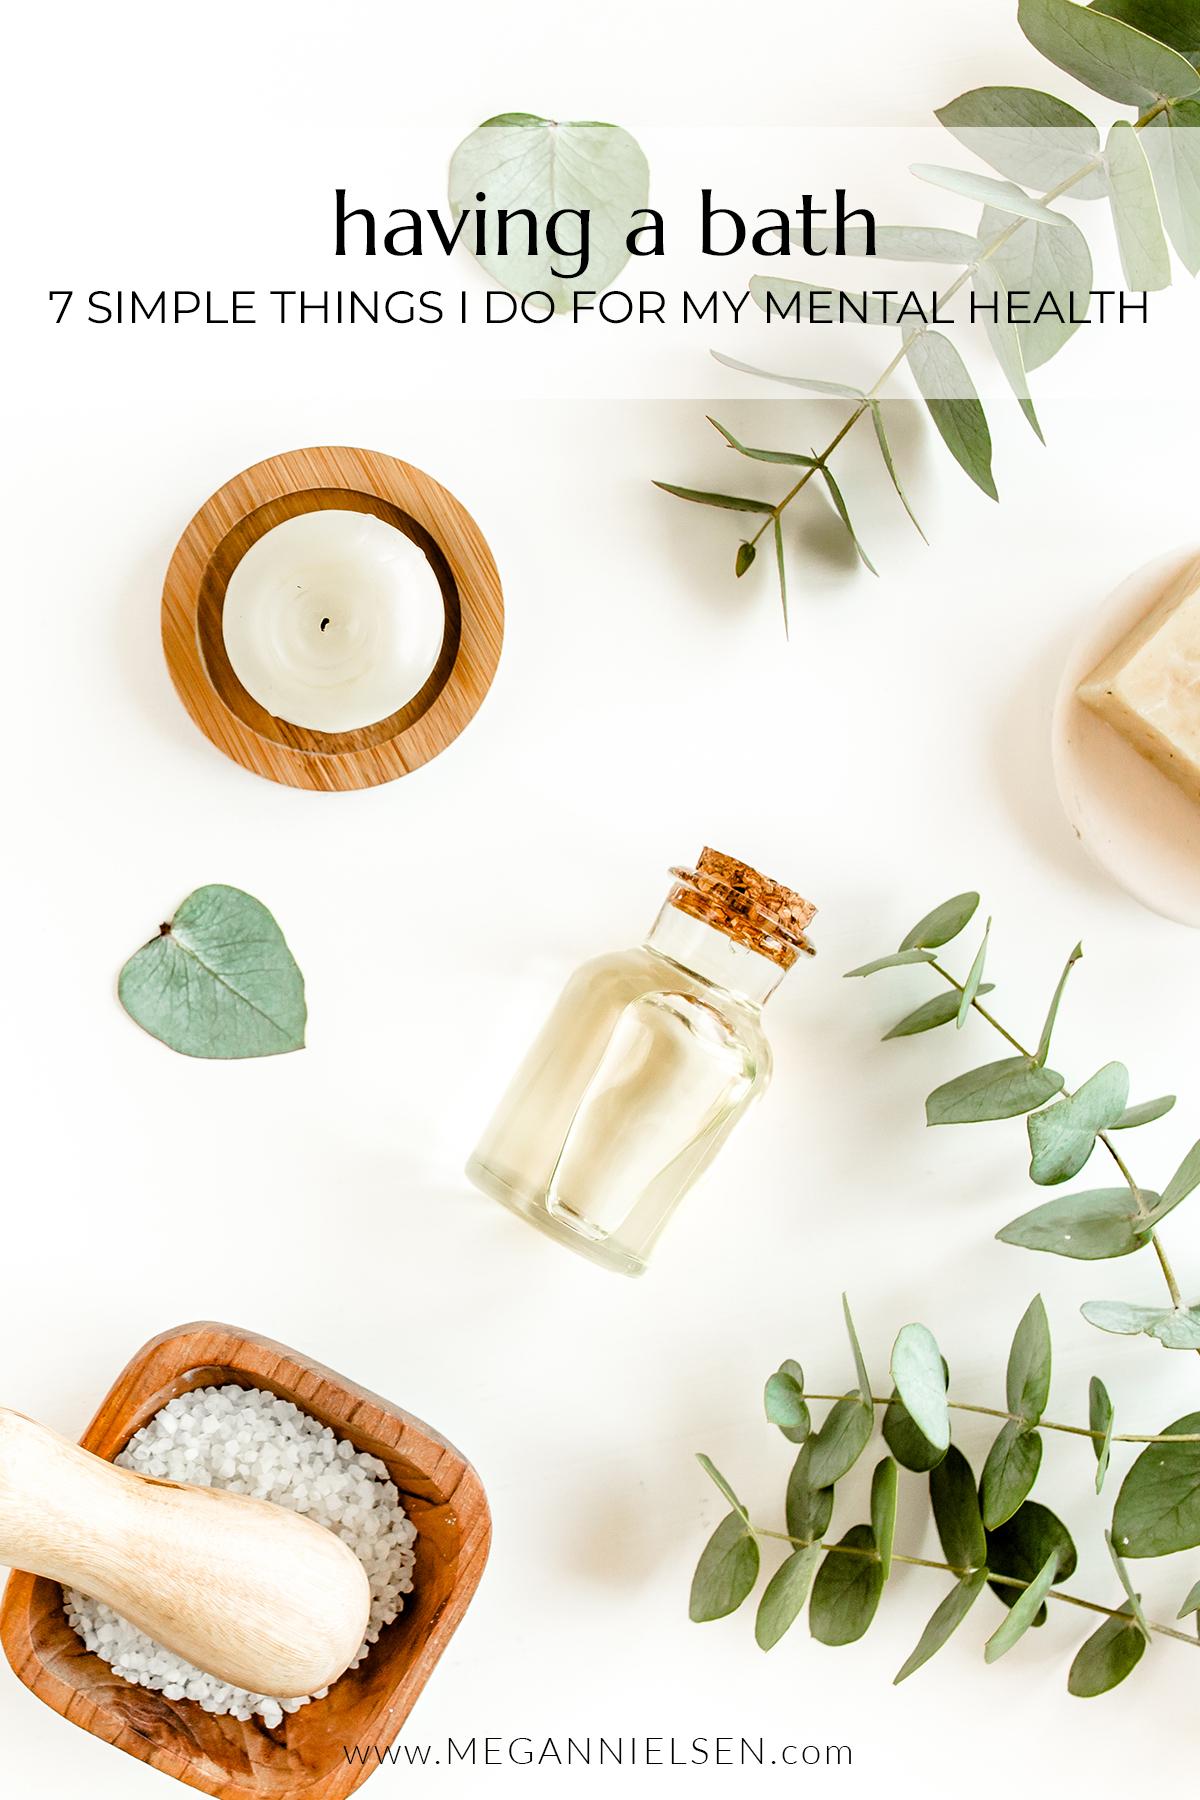 7 Simple Things I Do For My Mental Health | Having a Bath